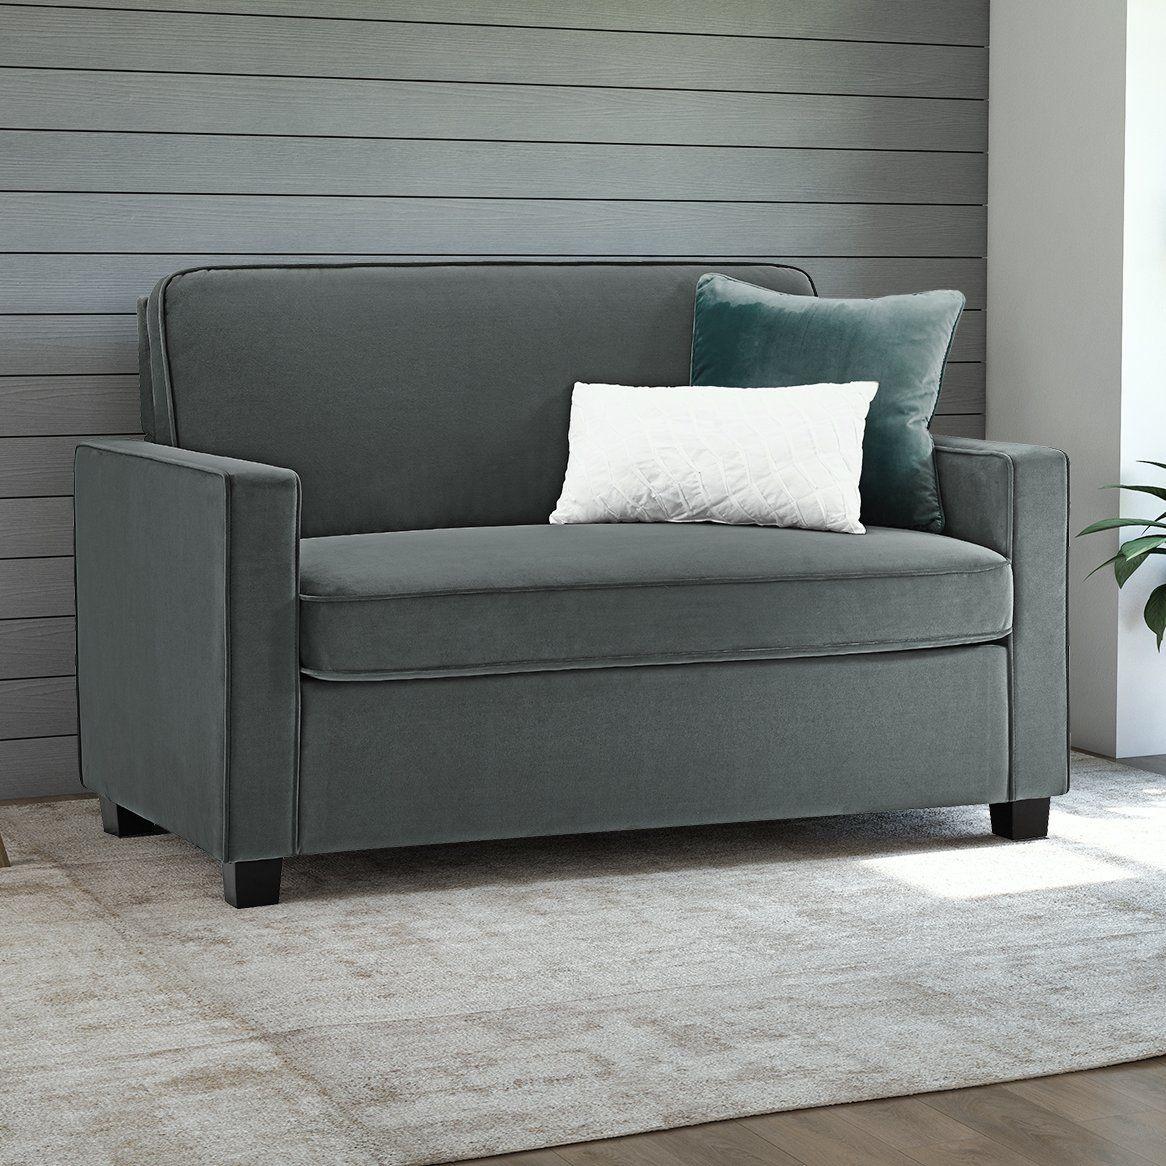 Cabell 54 Square Arm Sofa Bed Twin Sleeper Sofa Sleeper Sofa Sofa Bed